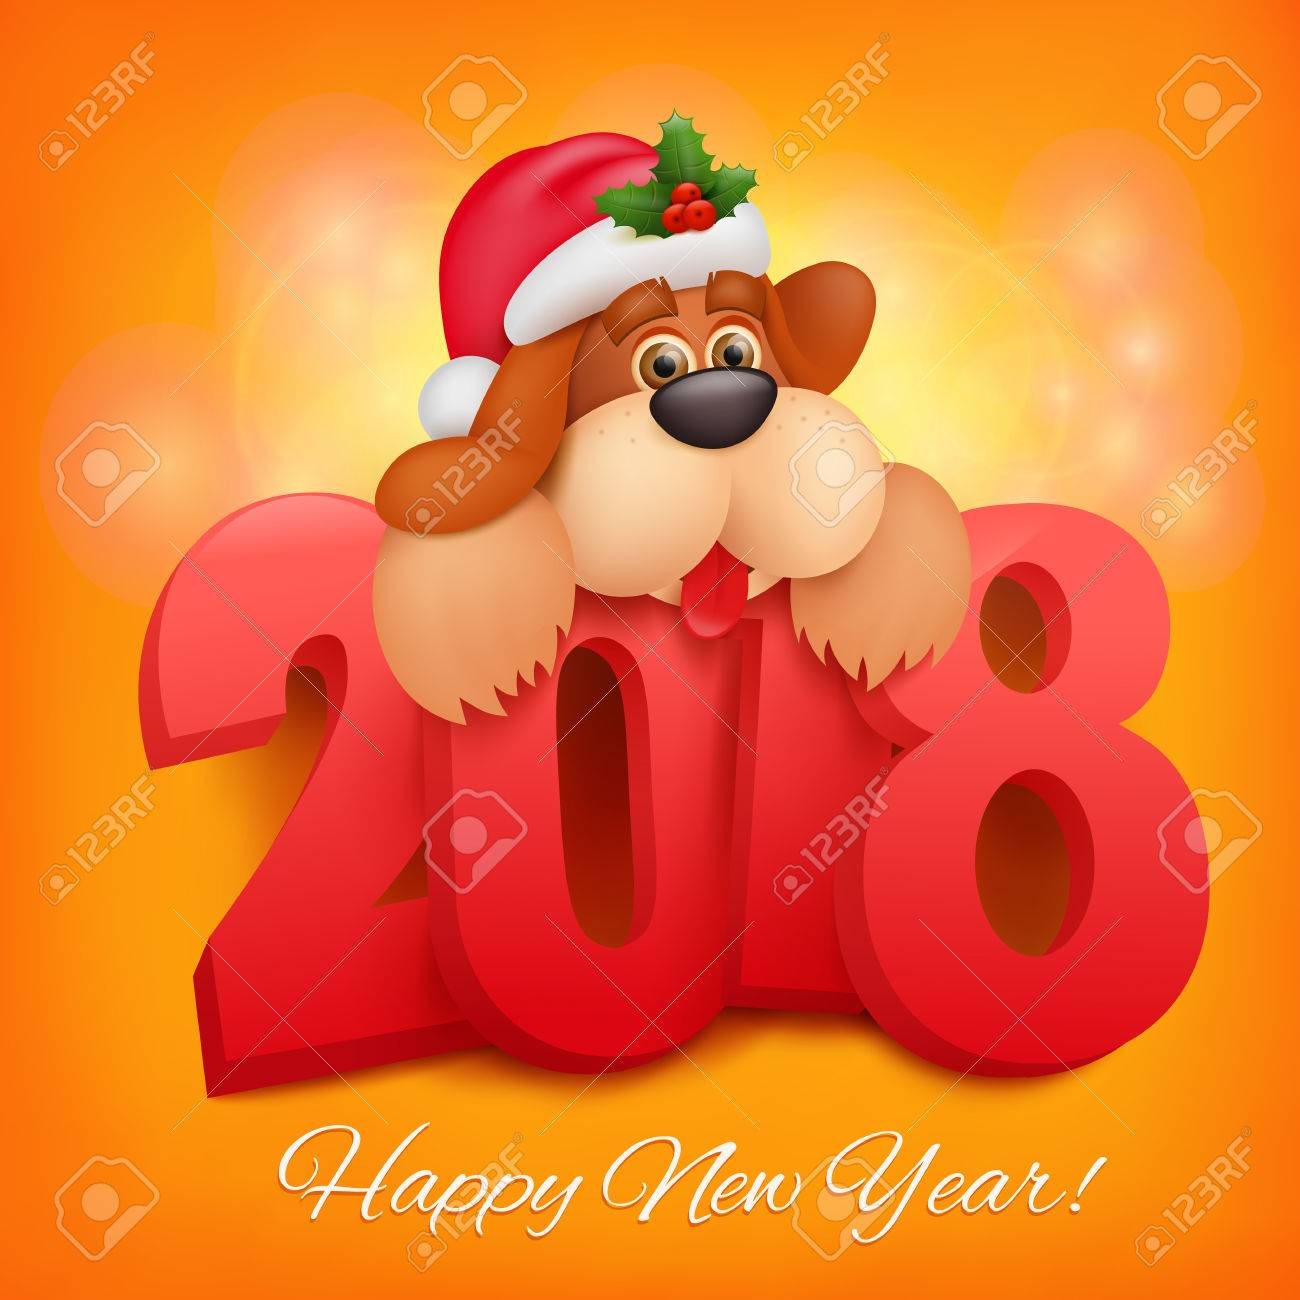 2018 happy new year greeting card celebration background with 2018 happy new year greeting card celebration background with funny dog character vector illustration kristyandbryce Gallery